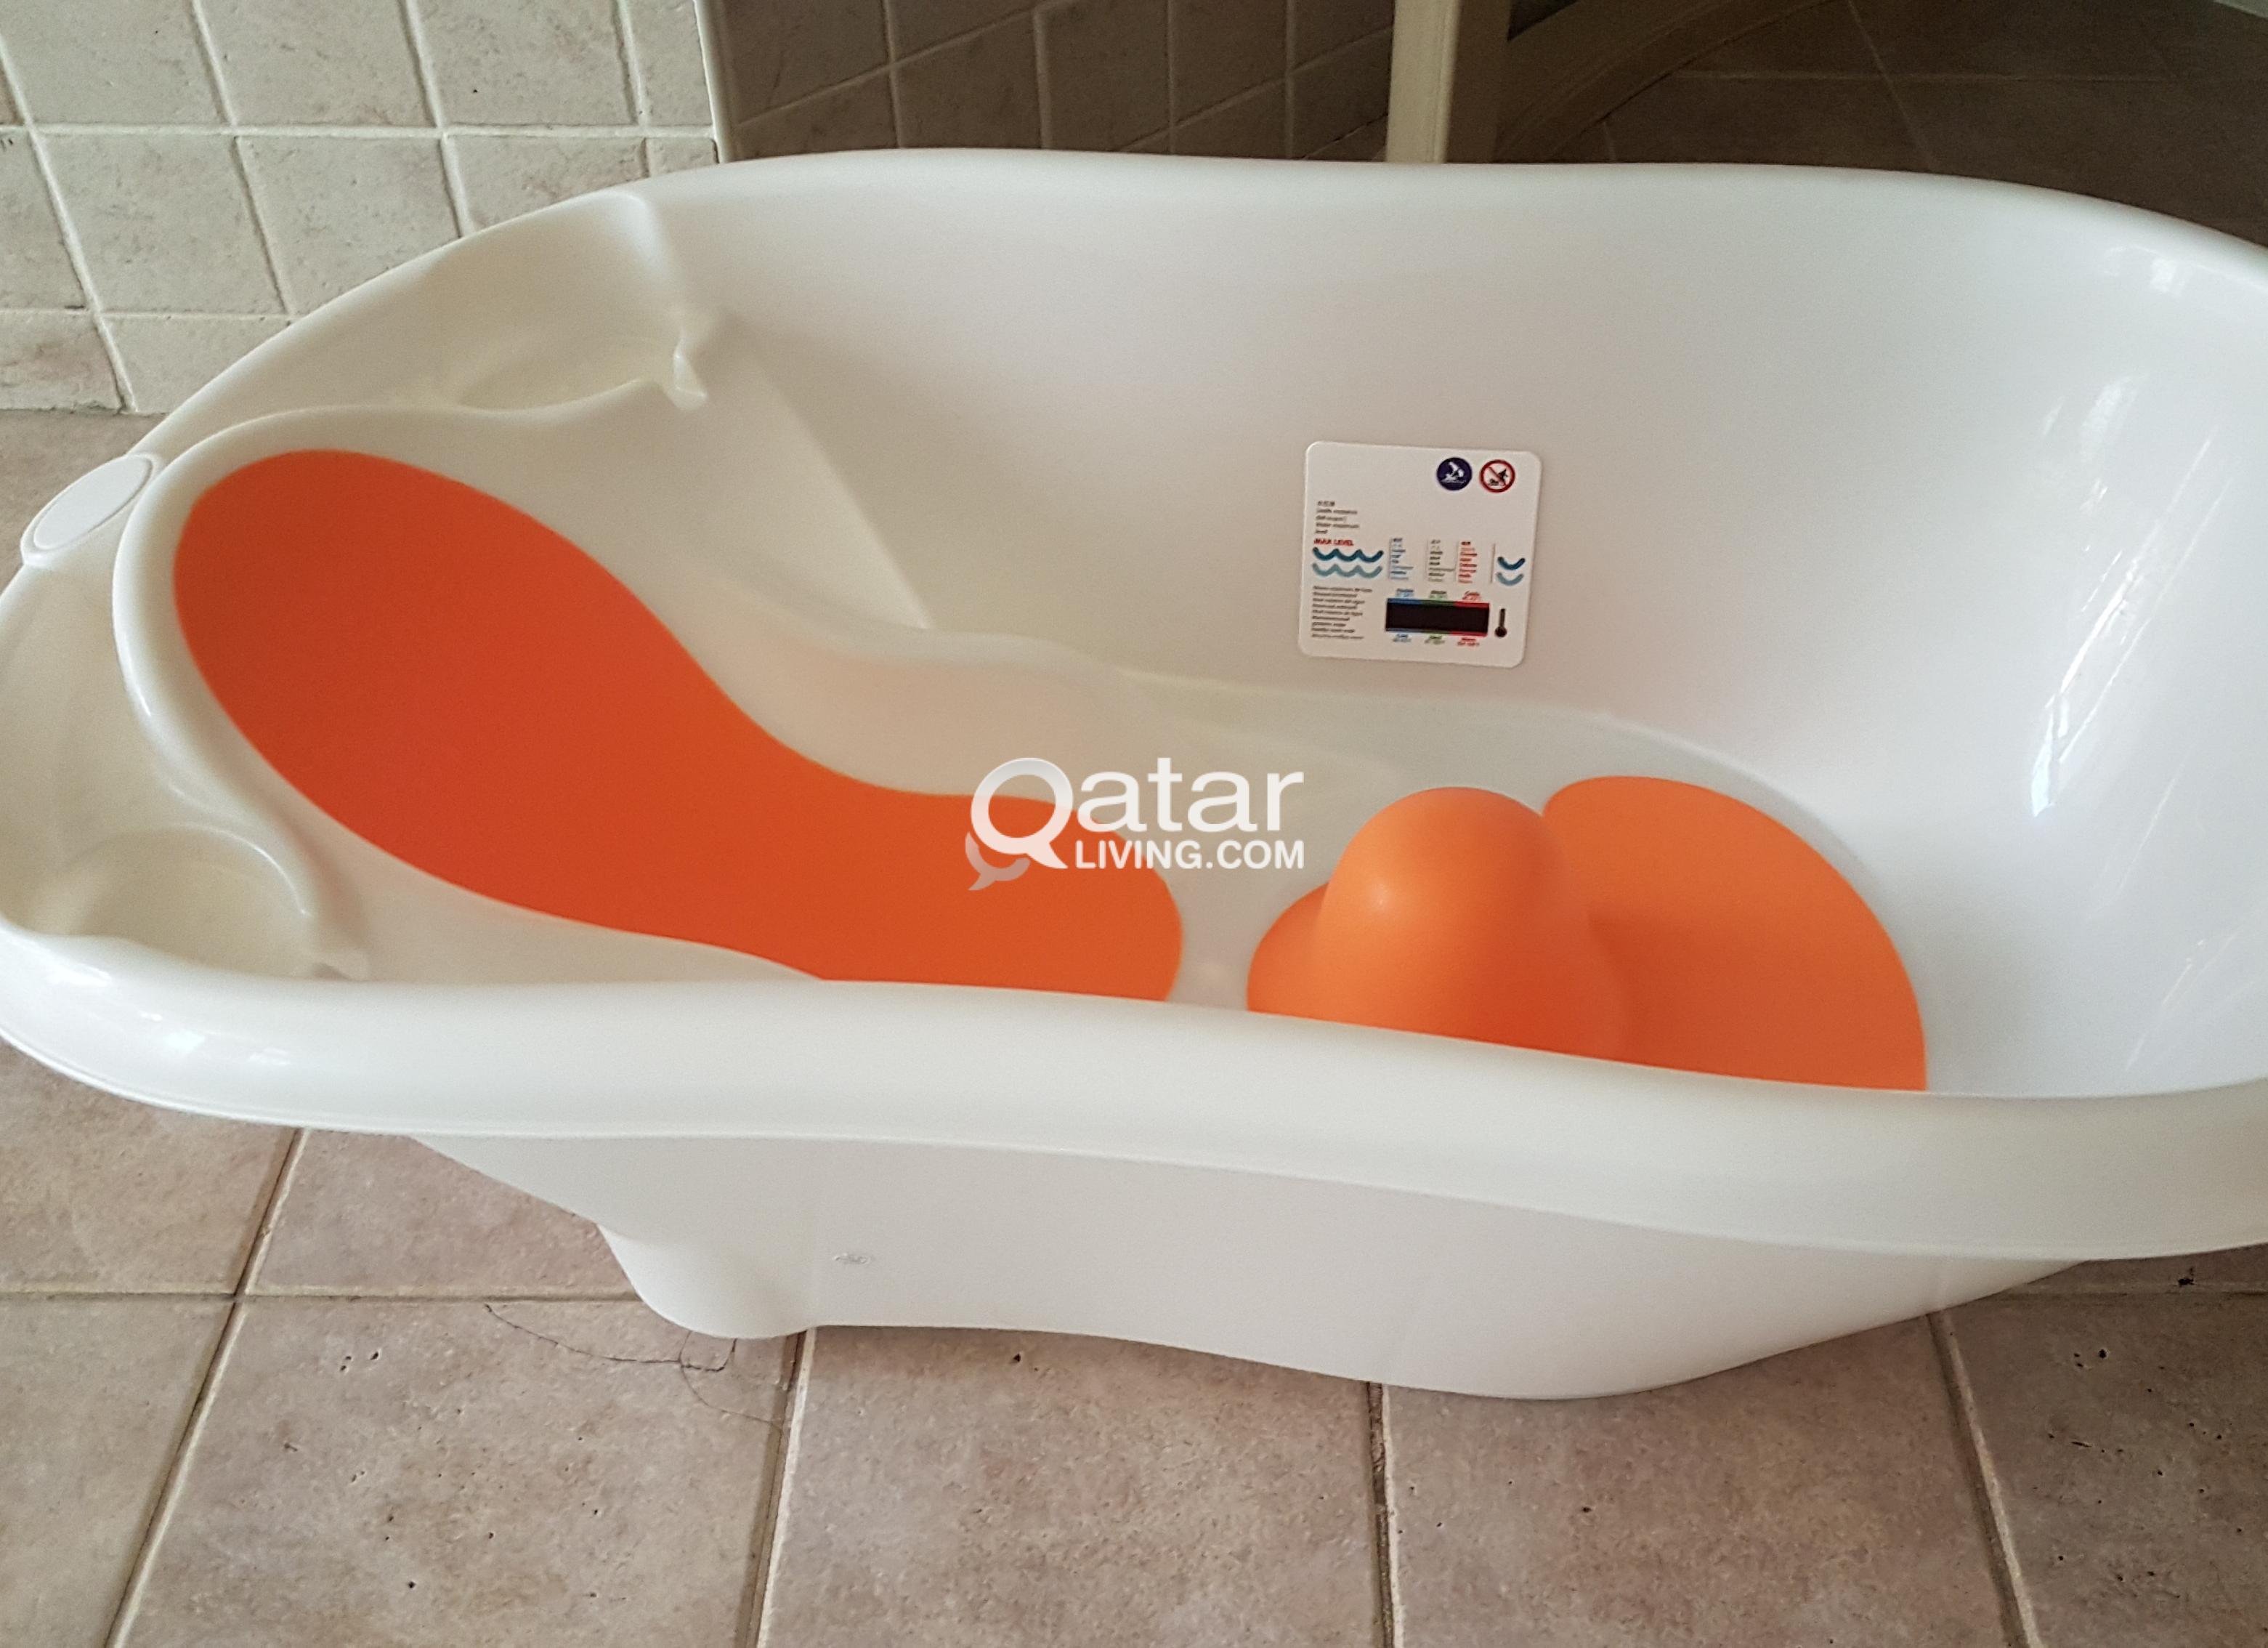 Baby bathtub with water temperature indicator   Qatar Living